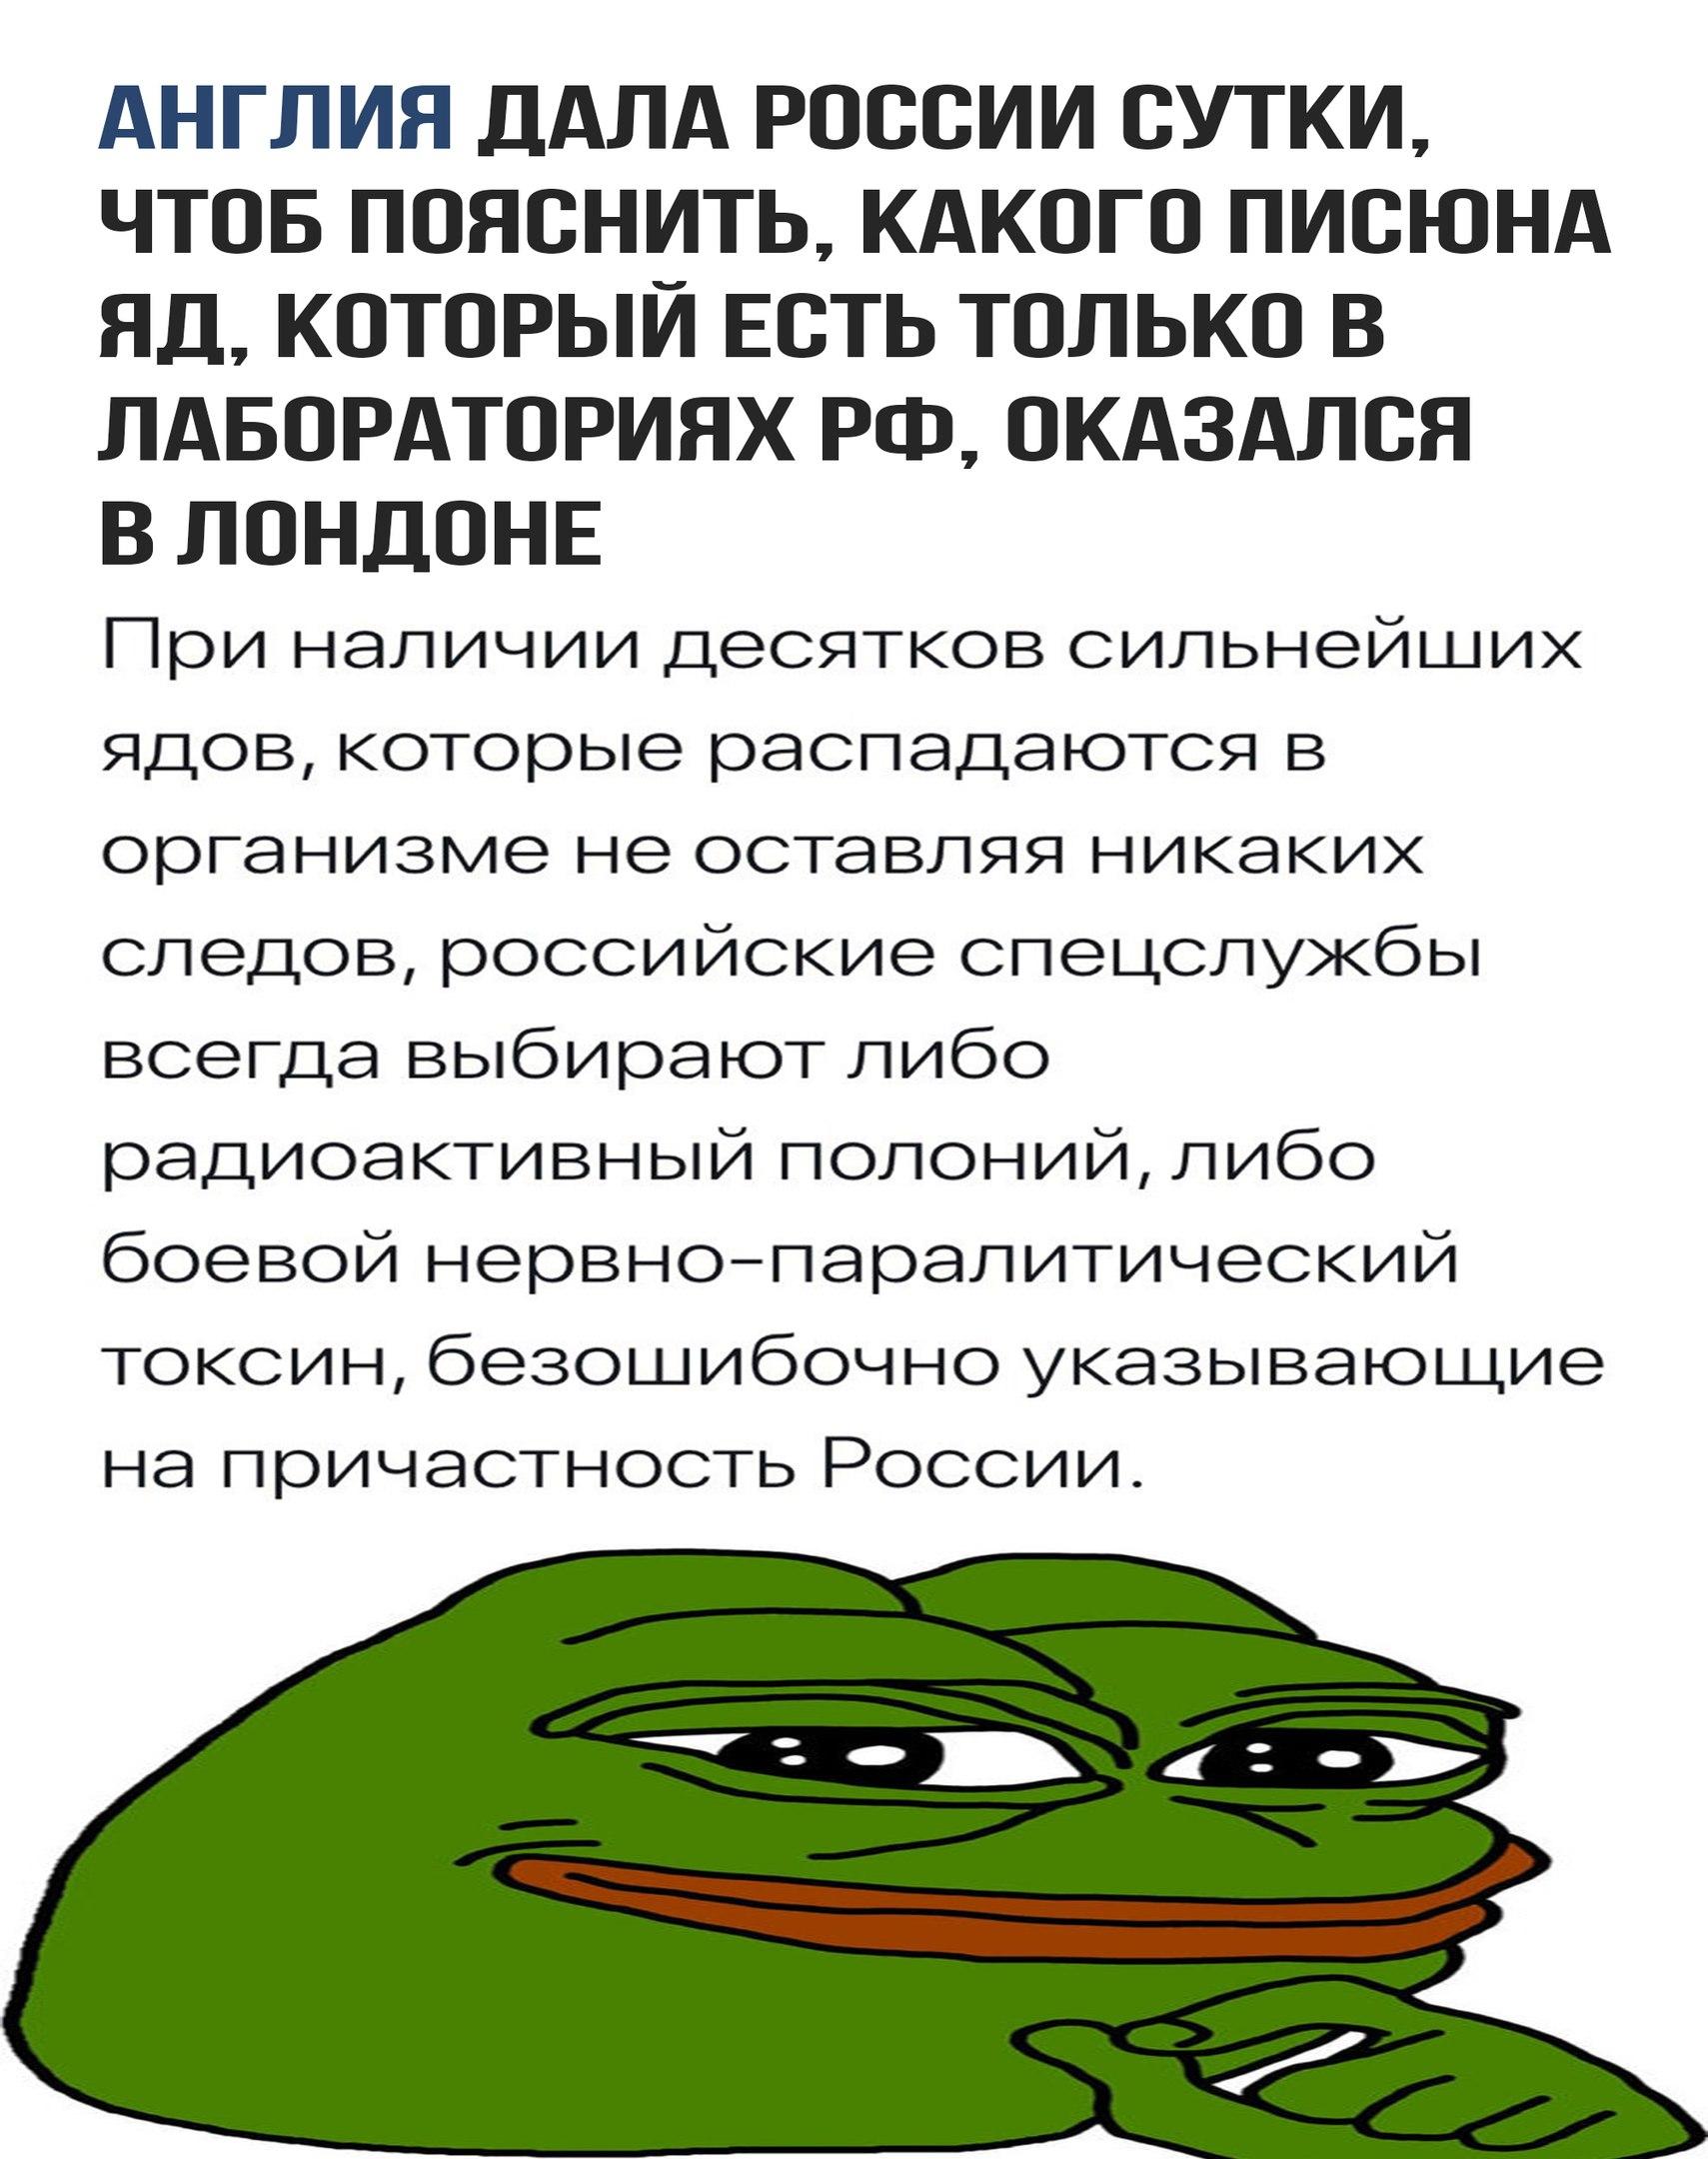 https://pp.userapi.com/c824201/v824201778/e97bc/F6_BXbaZr3k.jpg